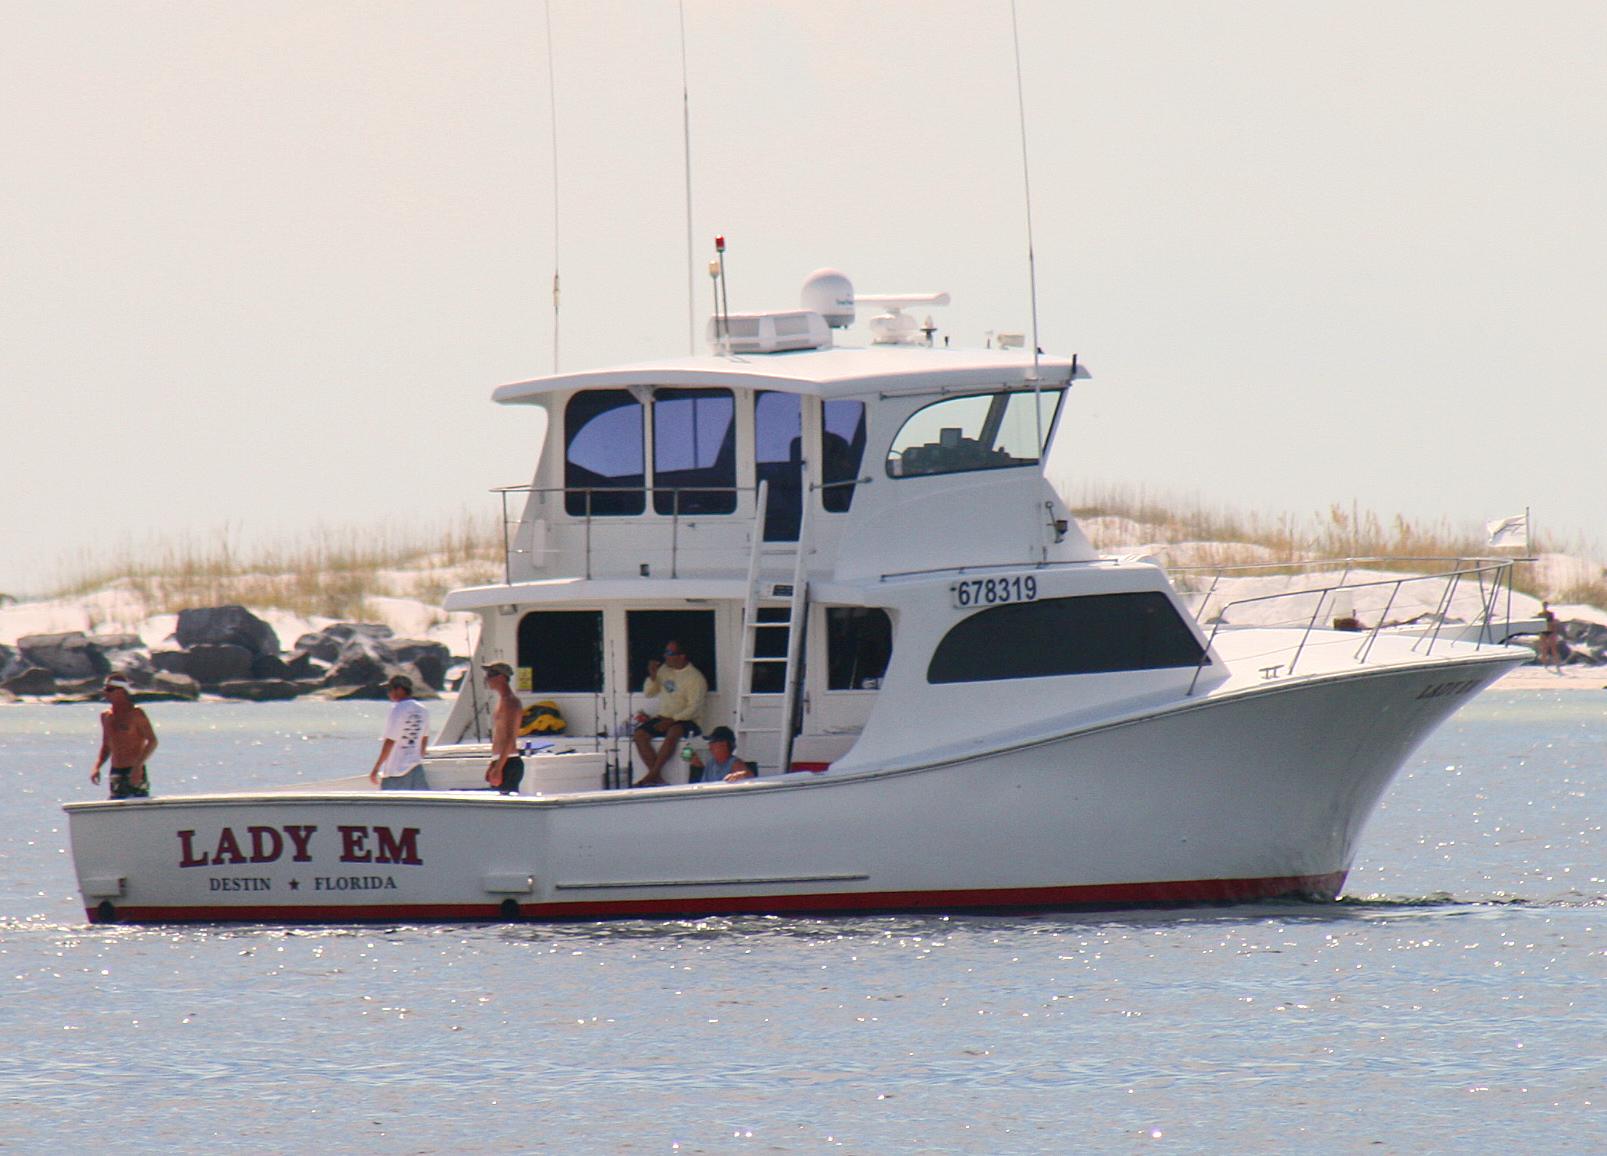 Deep sea fishing charters in destin fish destin for Sea fishing boats